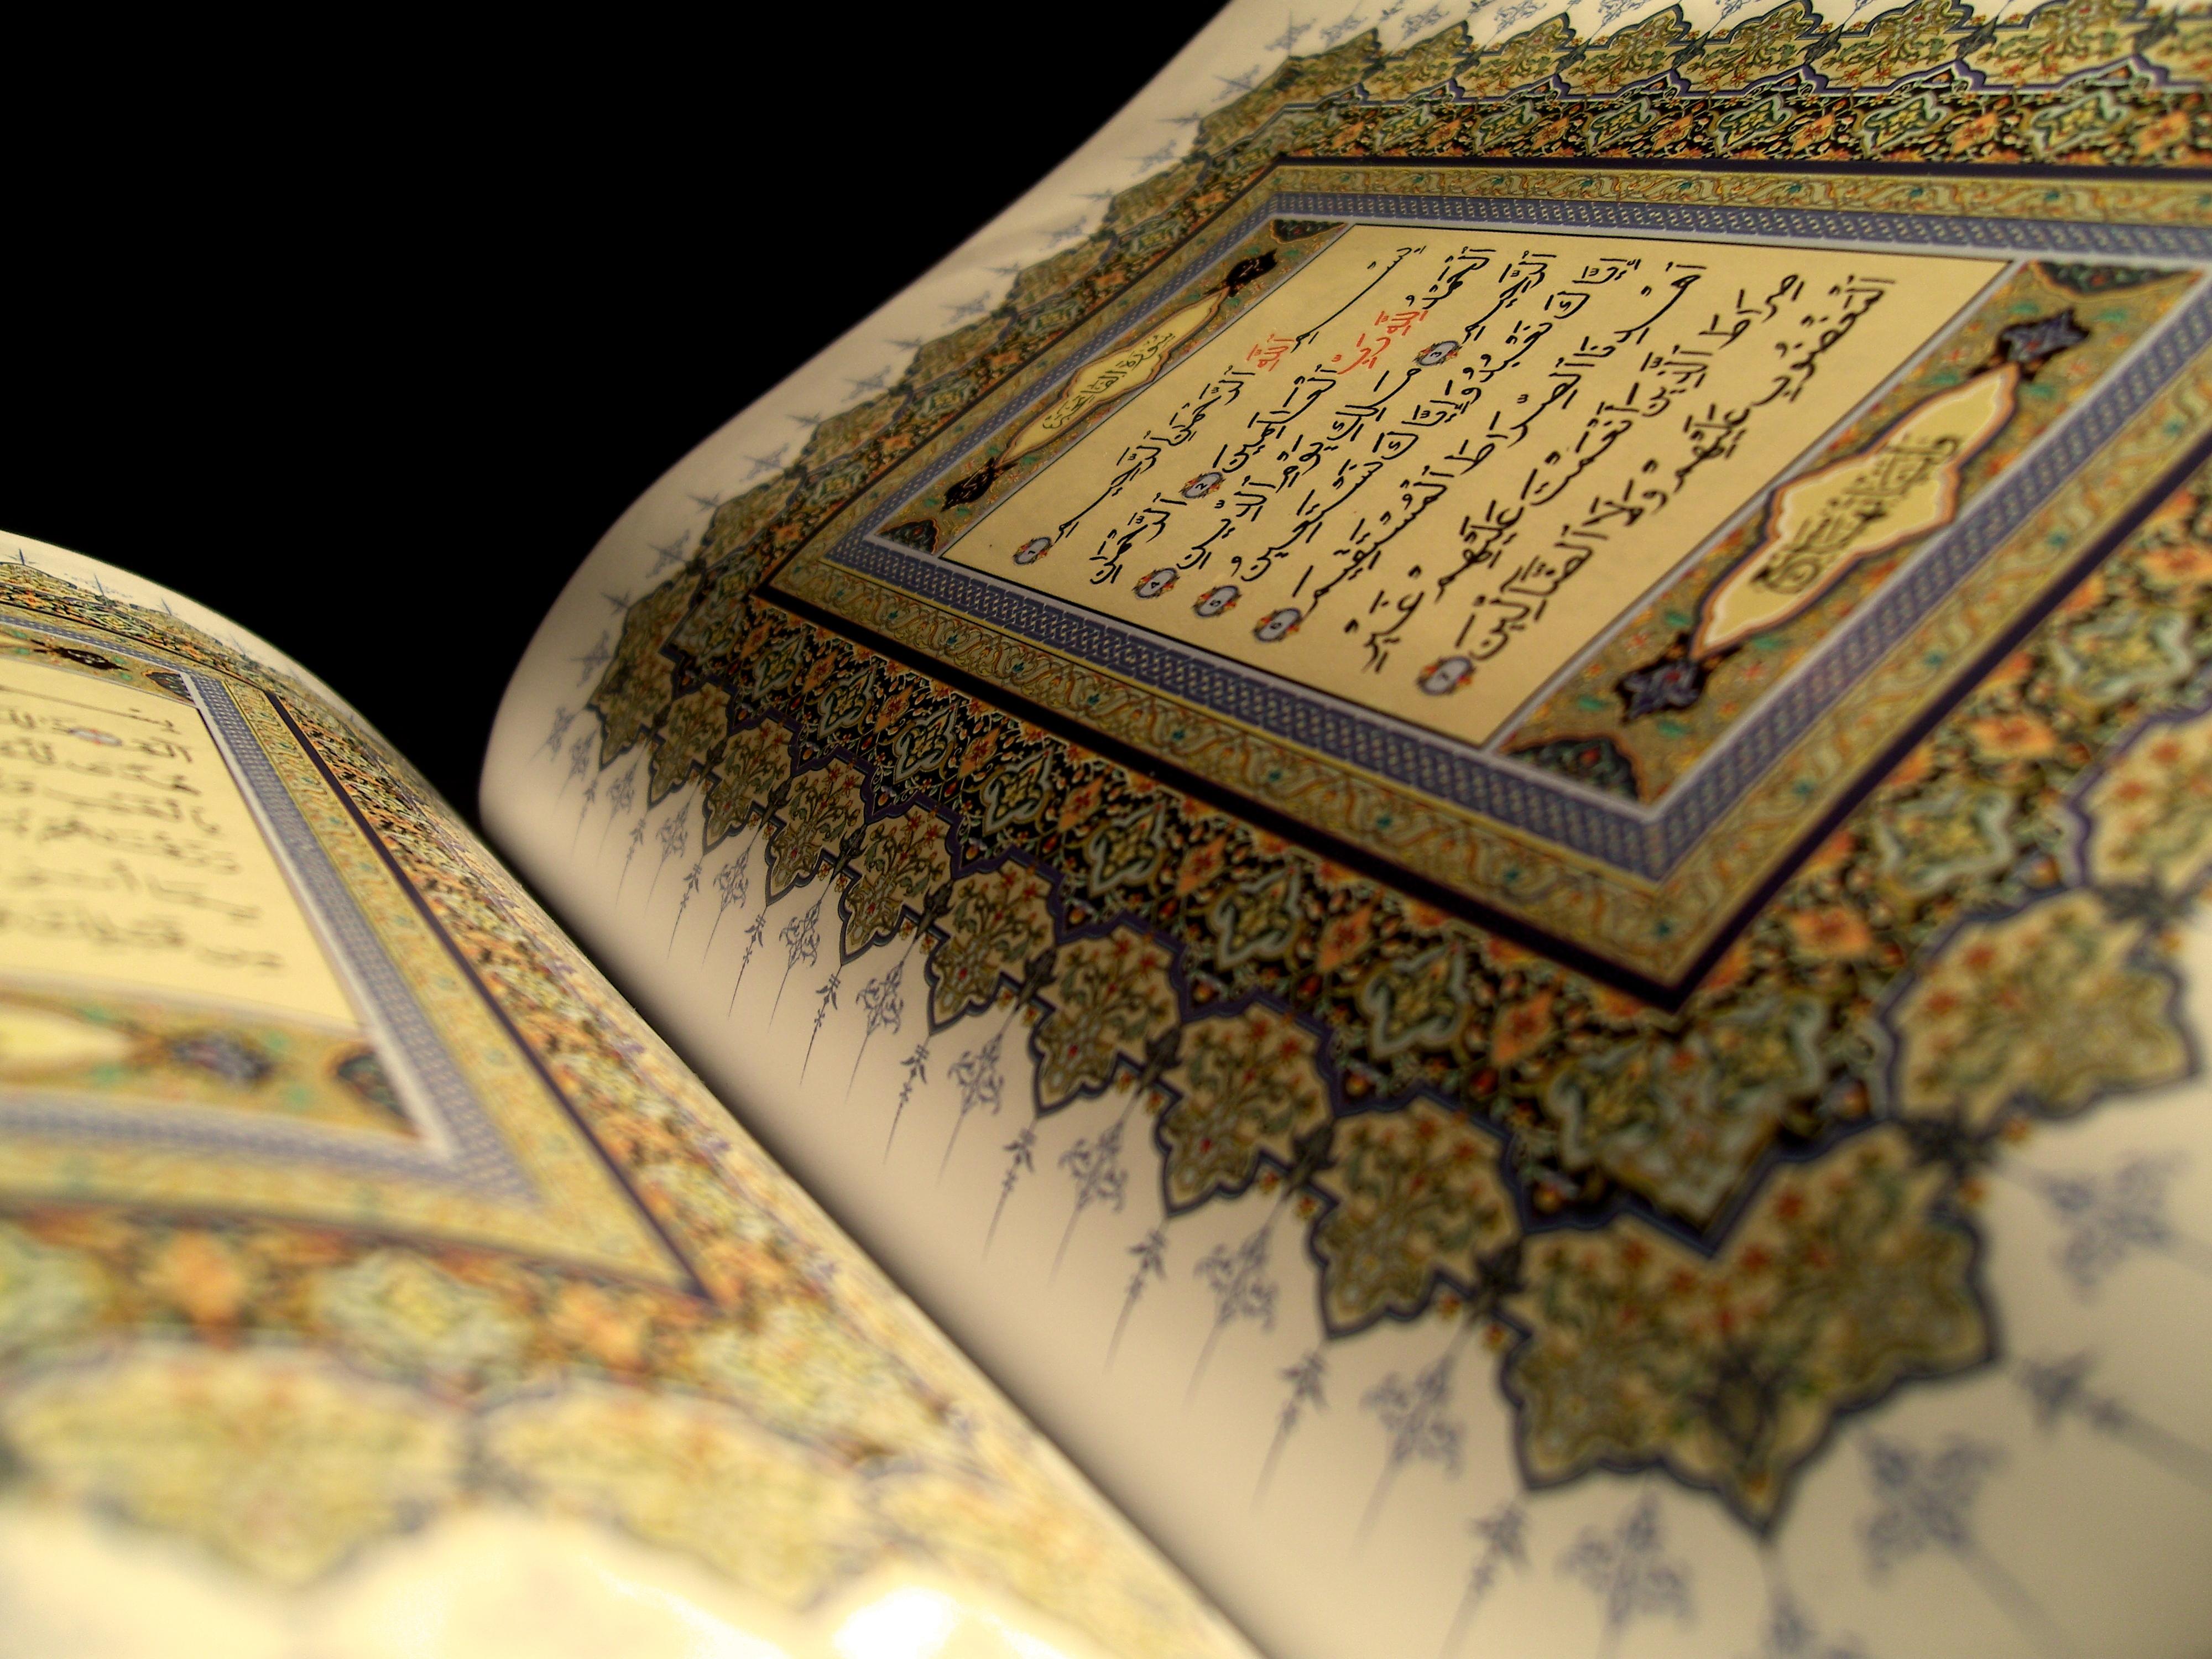 File:Quran, Tunisia.JPG - Wikimedia Commons